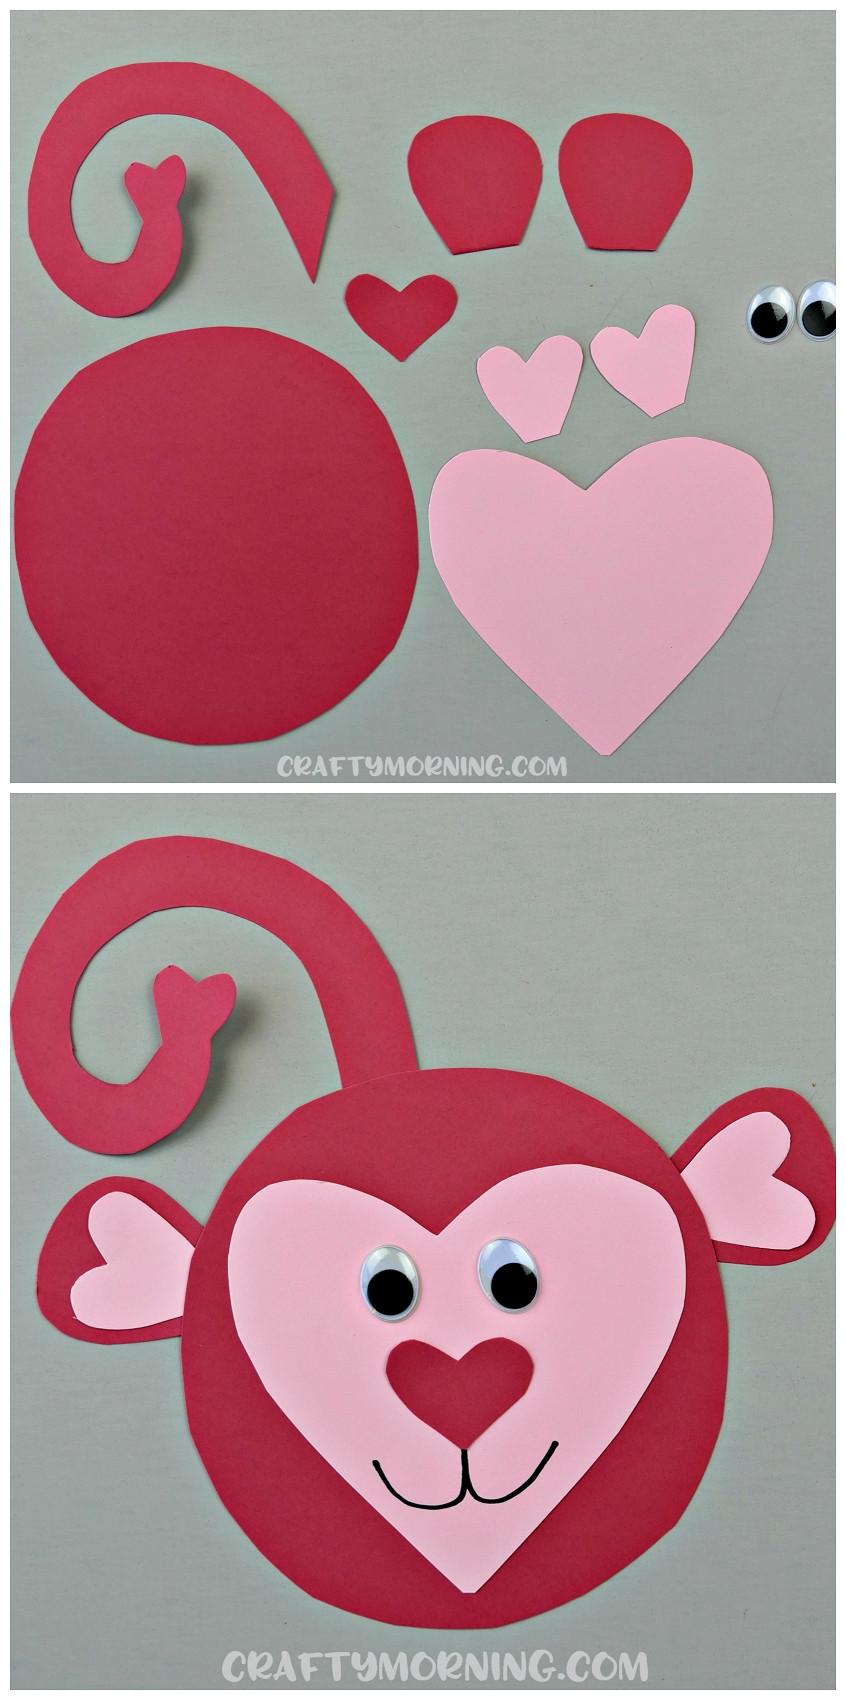 Valentine Craft Ideas For Preschoolers  Valentines Crafts For Boys